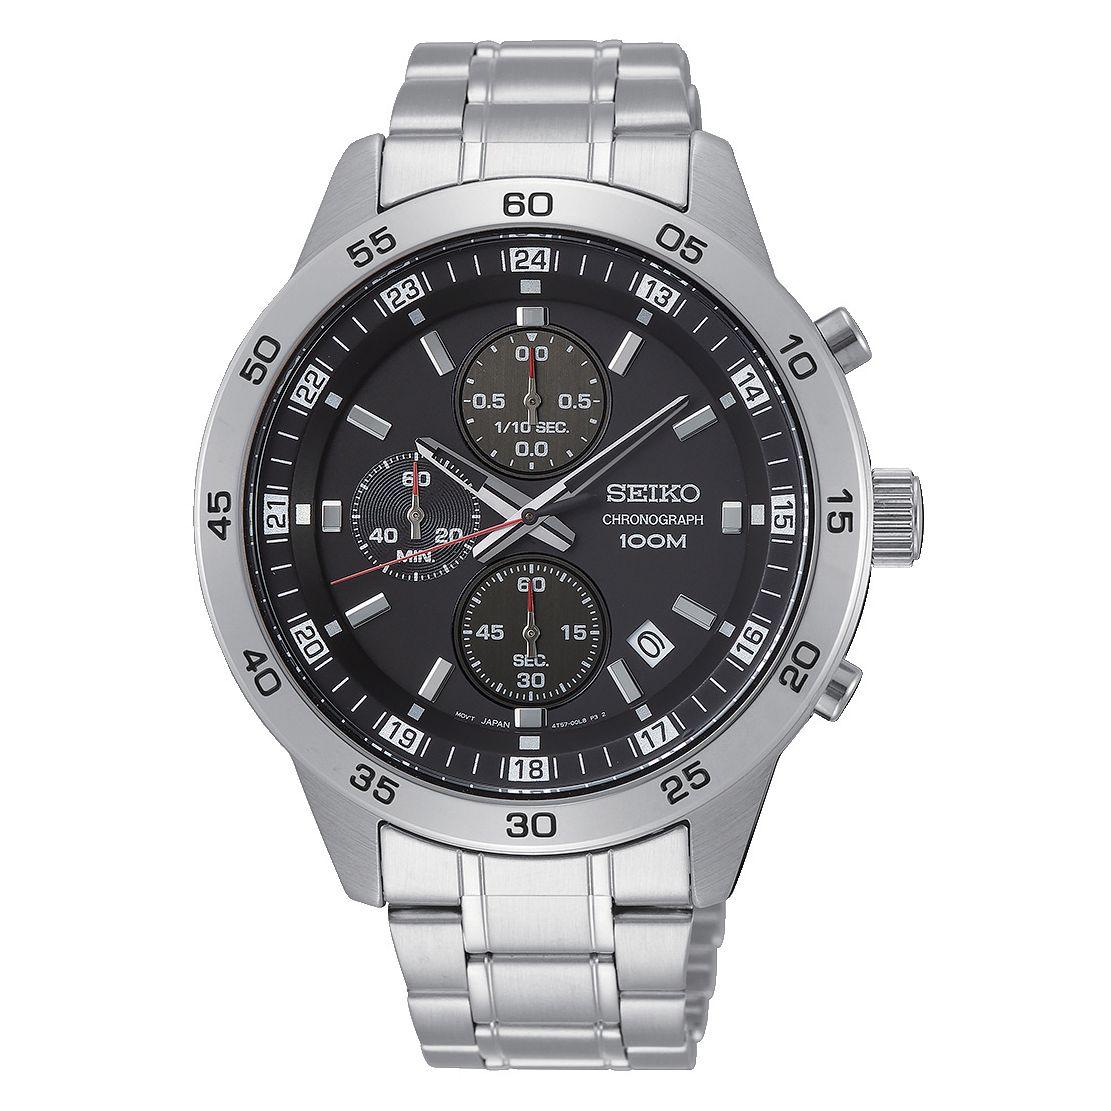 Seiko Chronograph Men's Stainless Steel Bracelet Watch £74.99 @ H Samuel